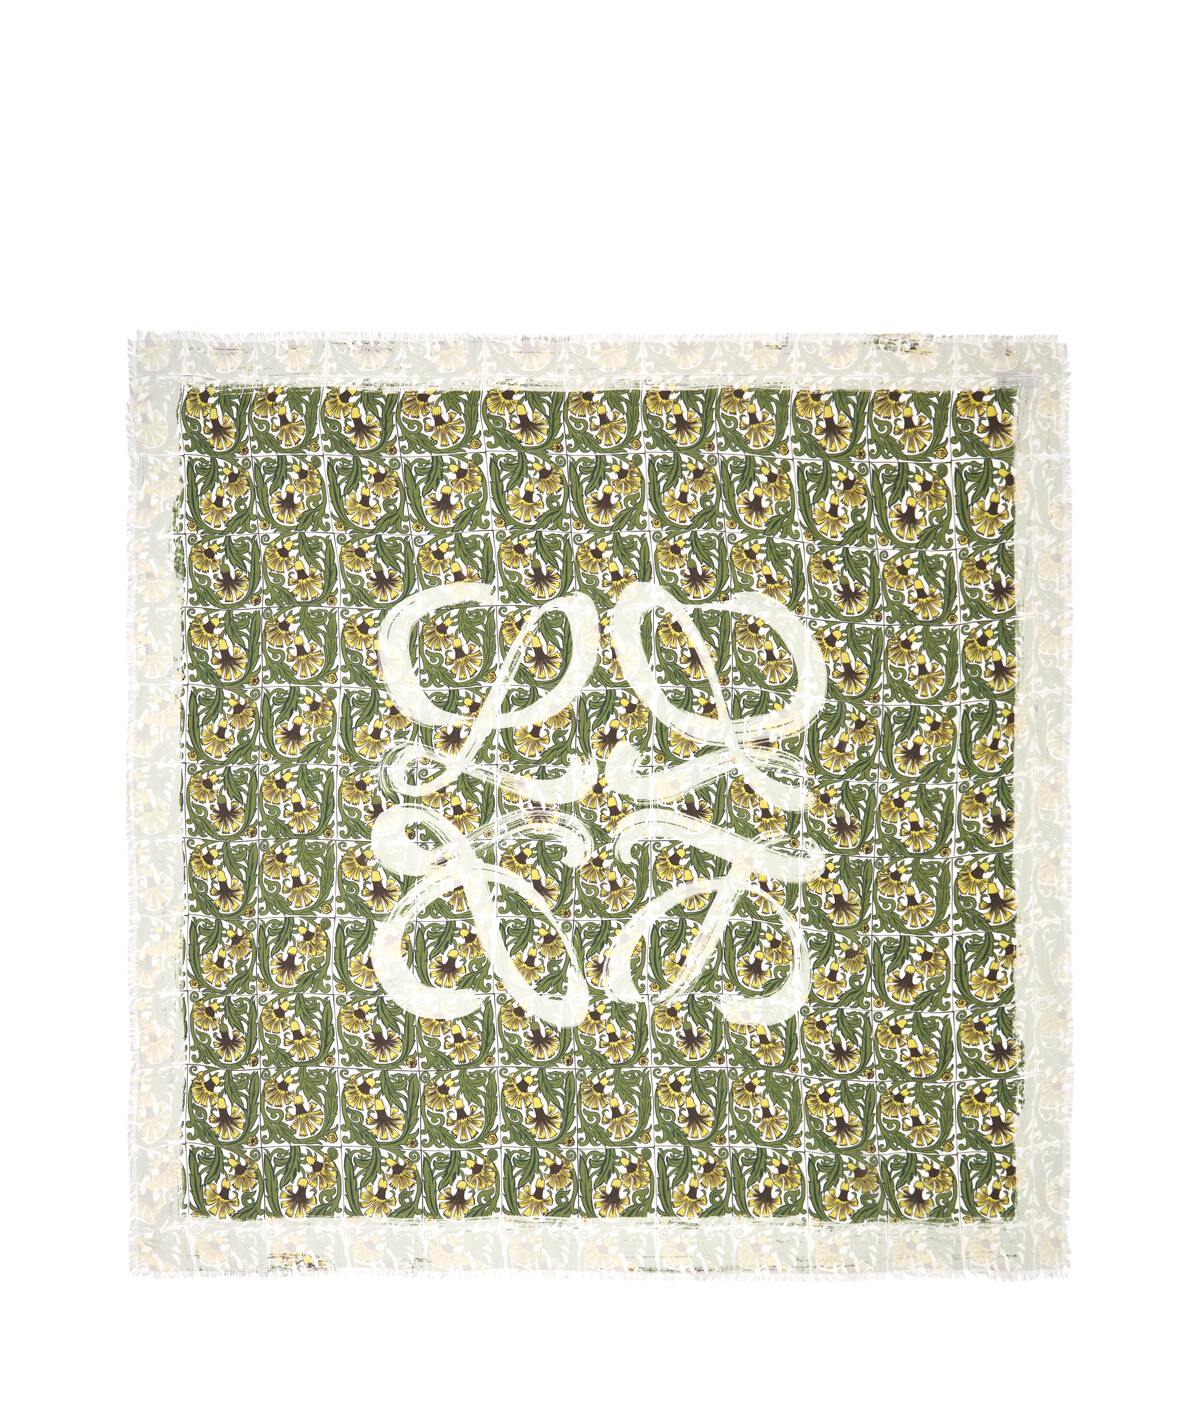 LOEWE 140X140 Scarf Flowers Anagram グリーン/ホワイト front